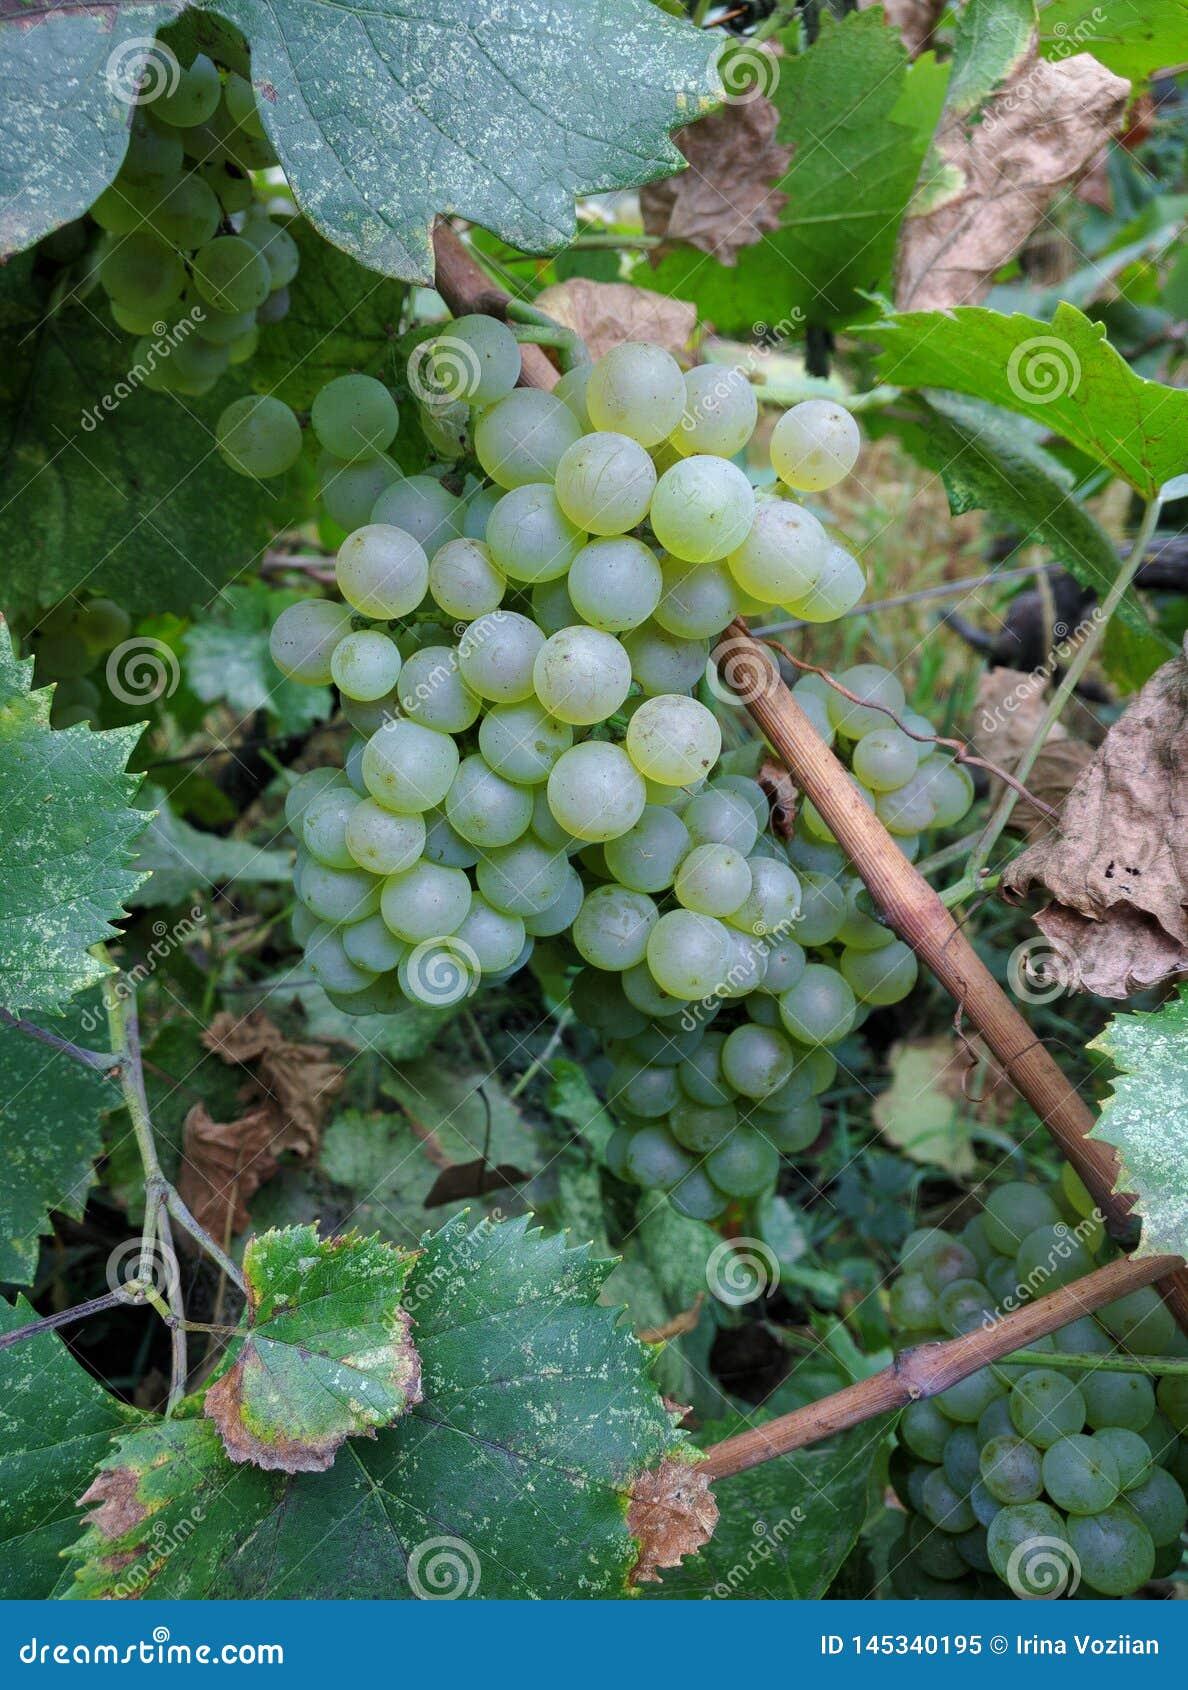 Beautiful ripe white grape hanging on grape tree